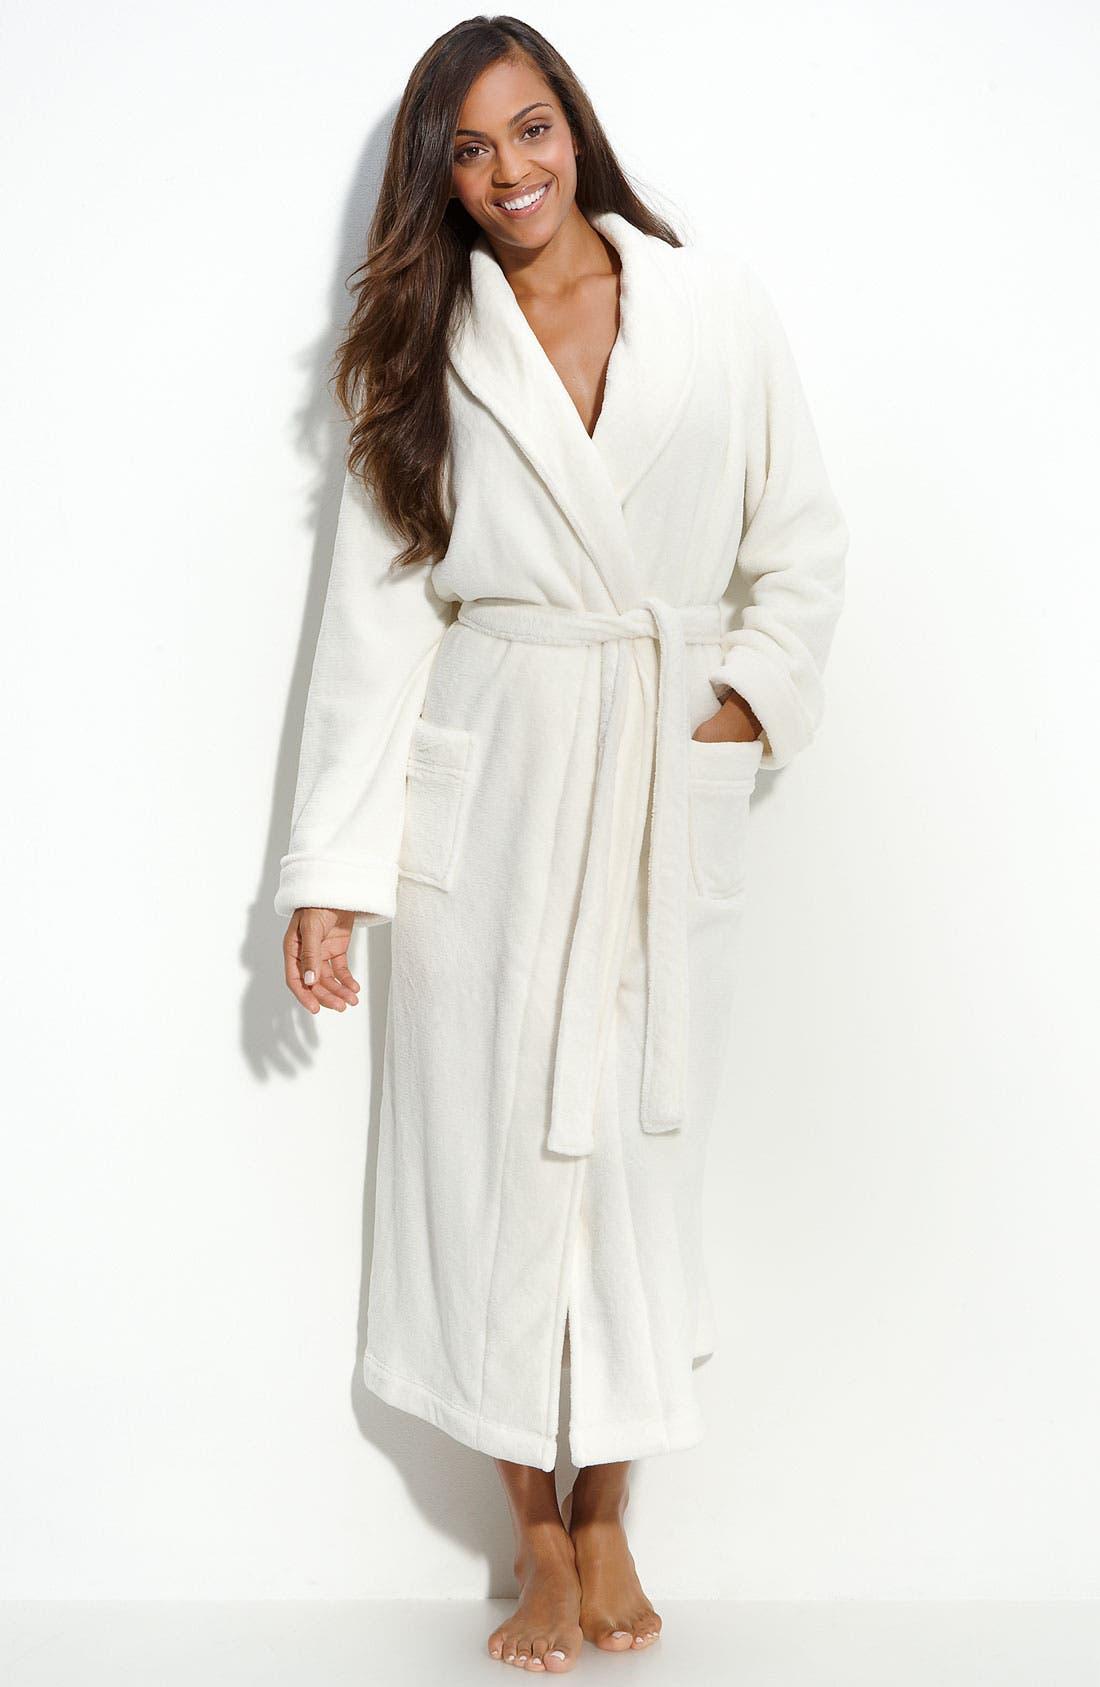 Alternate Image 1 Selected - Nordstrom 'Powder Plush' Robe